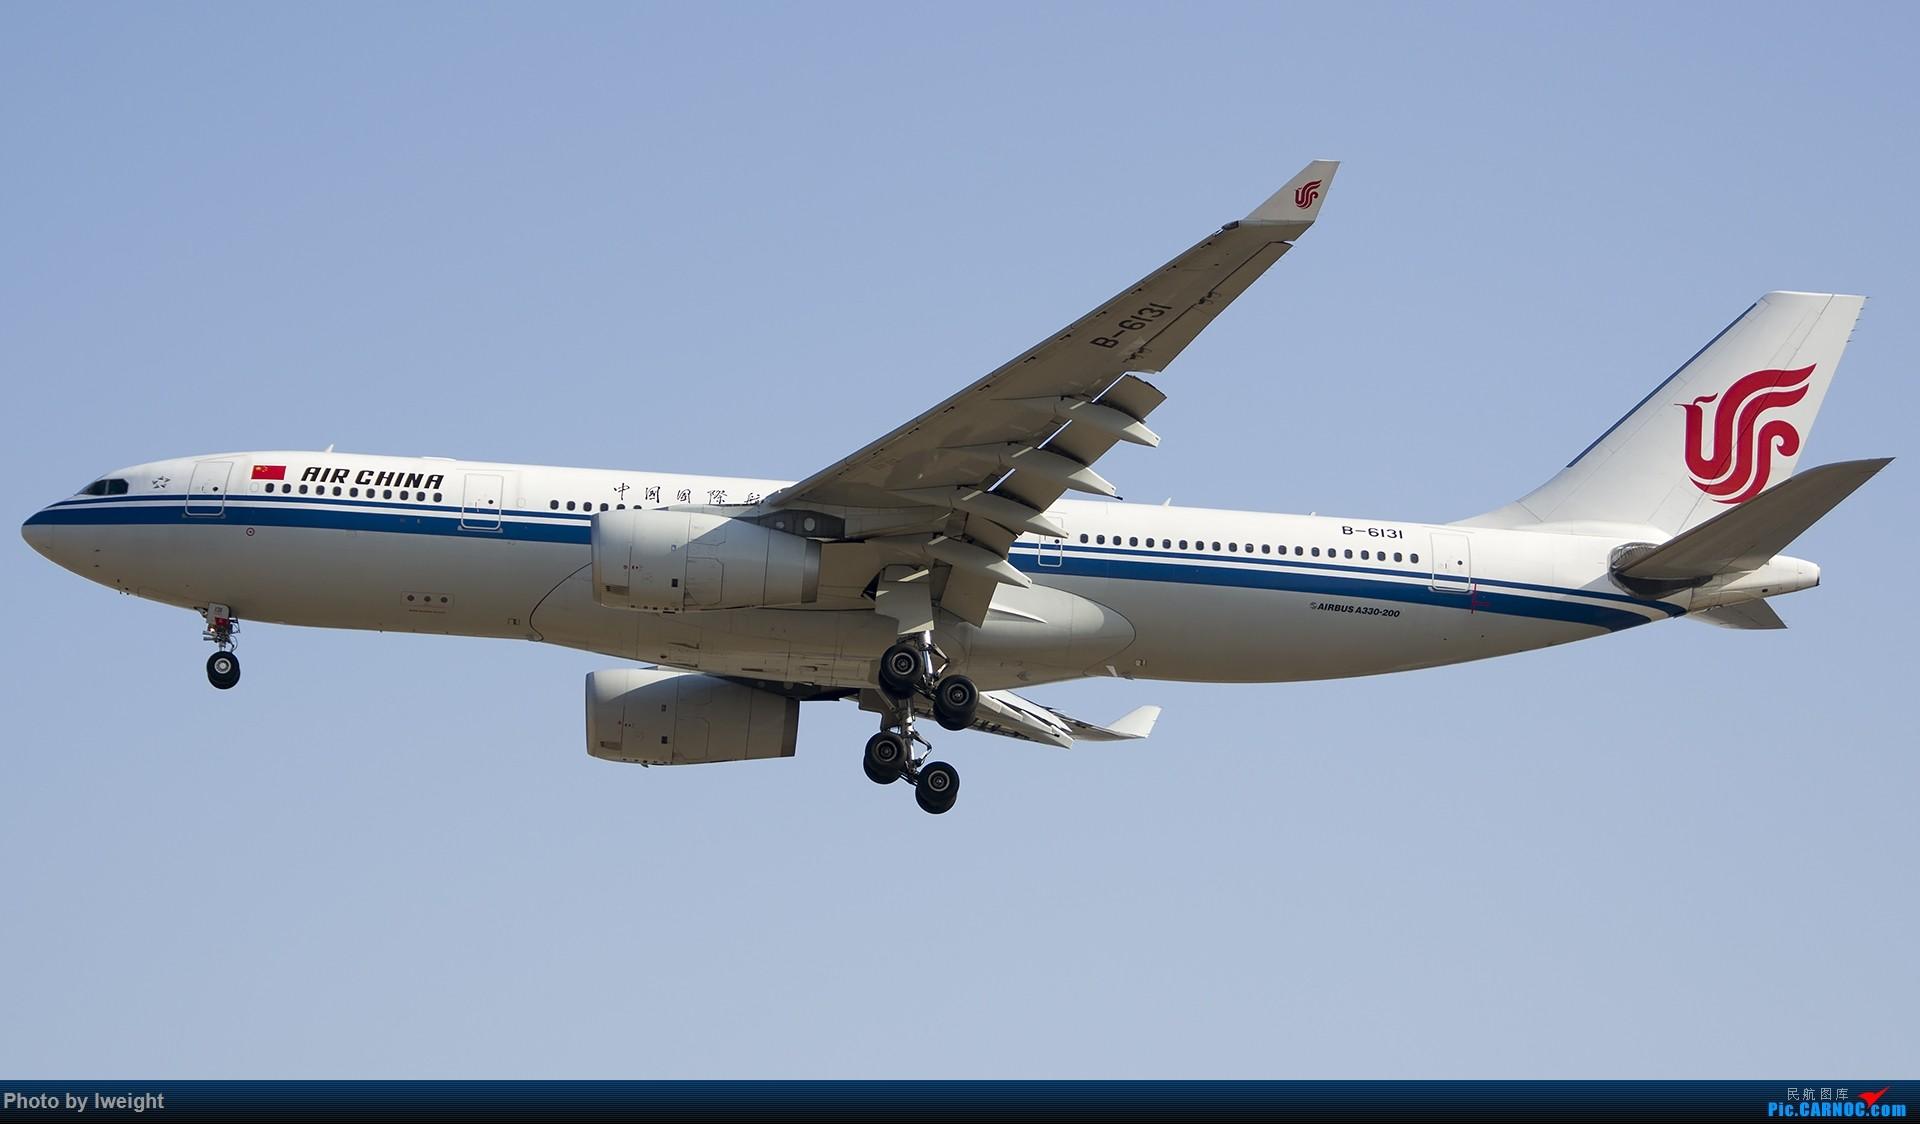 Re:[原创]庆祝升级777,发上今天在首都机场拍的所有飞机【2014-12-14】 AIRBUS A330-200 B-6131 中国北京首都国际机场